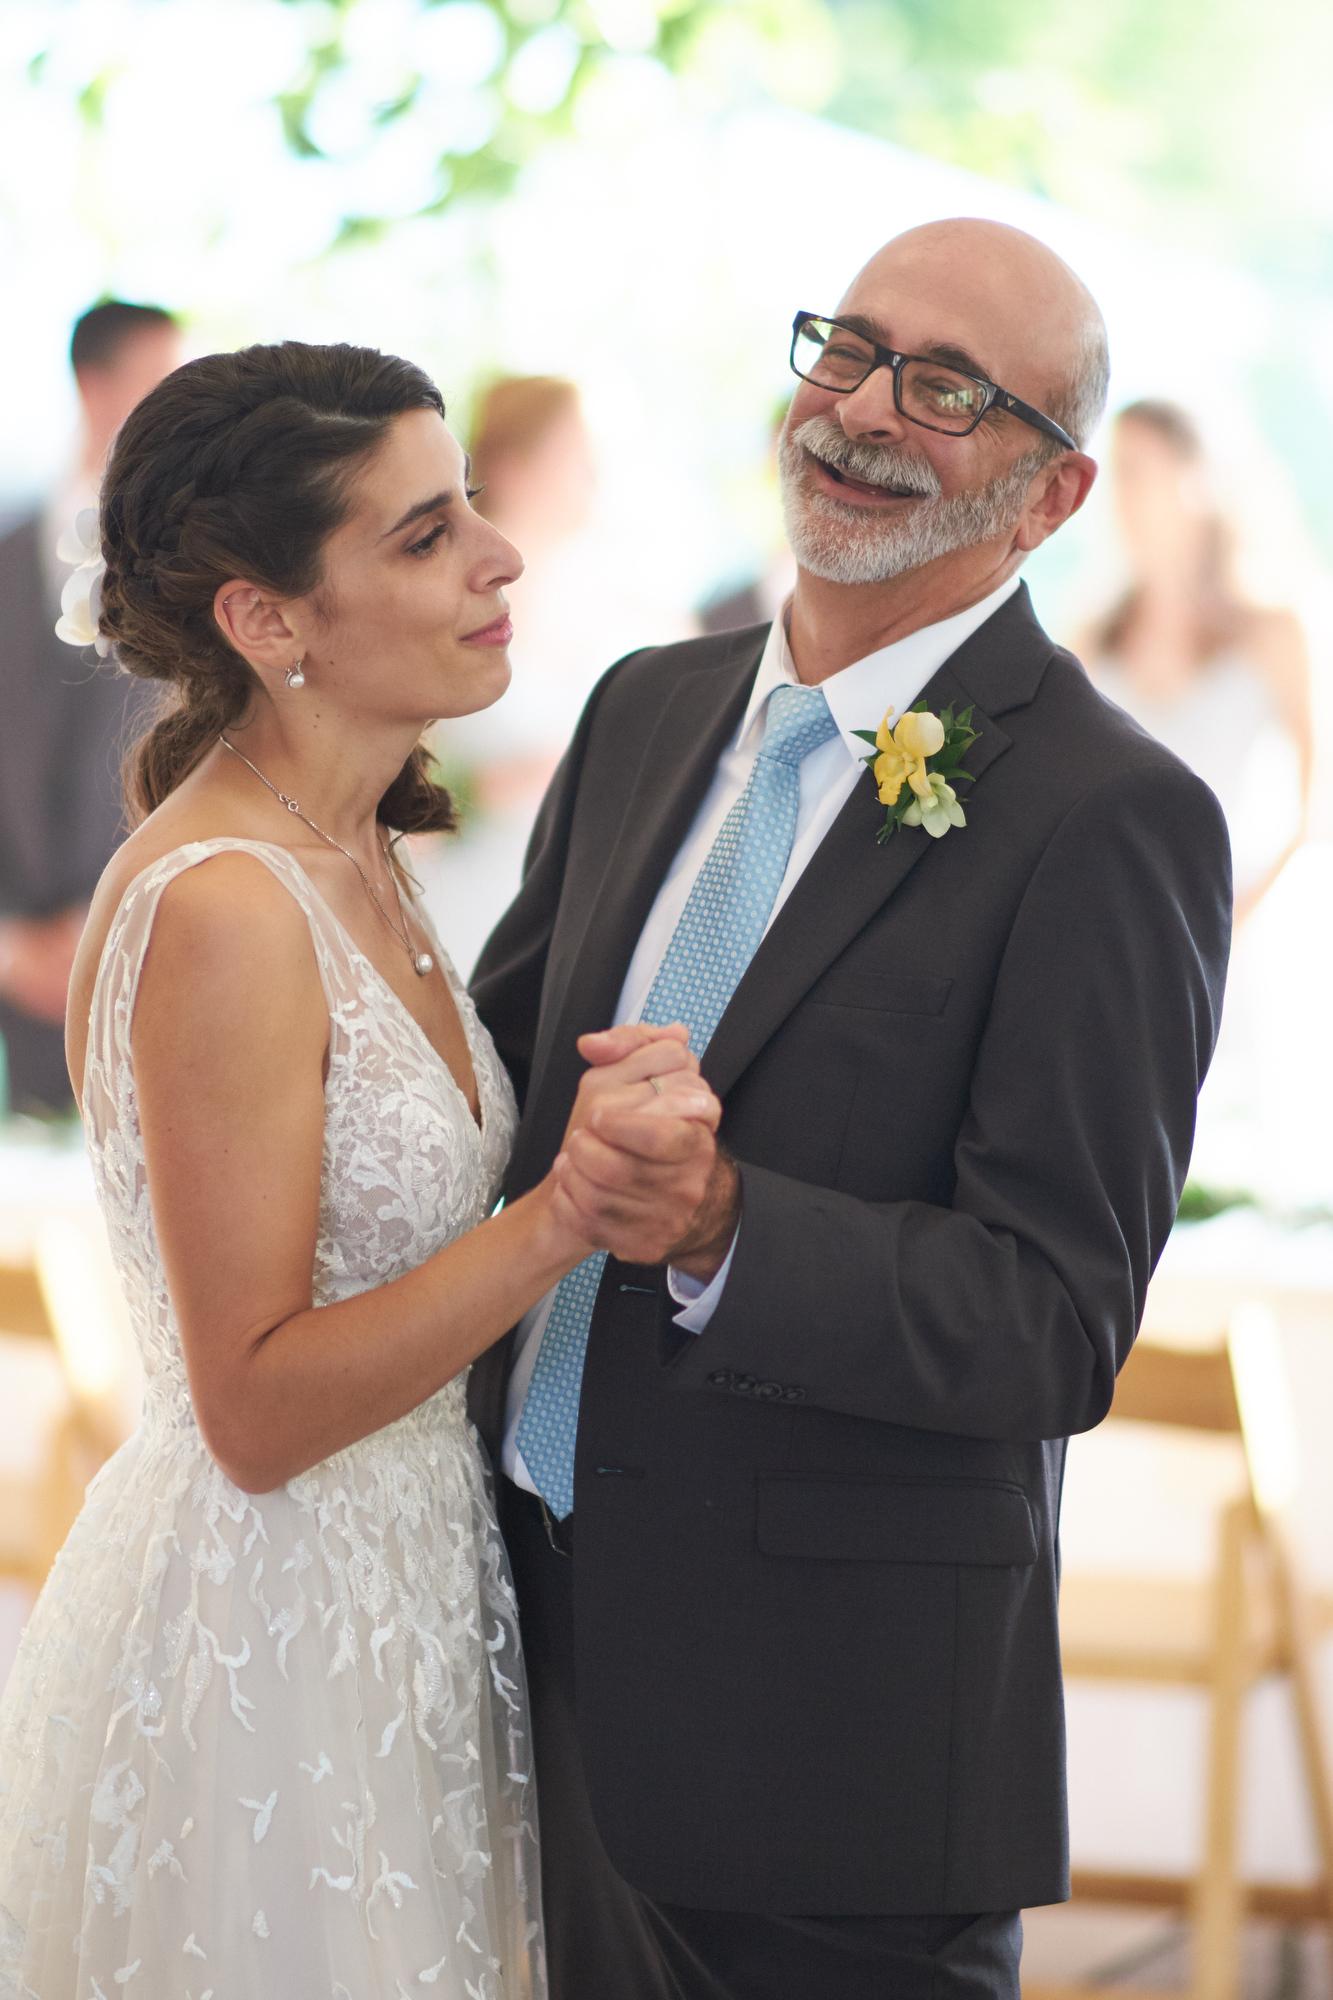 2019-07-20_18-00-36_FUJIFILM_X-T1_(c)_RH_weddingsbyryanandkate.com.JPG